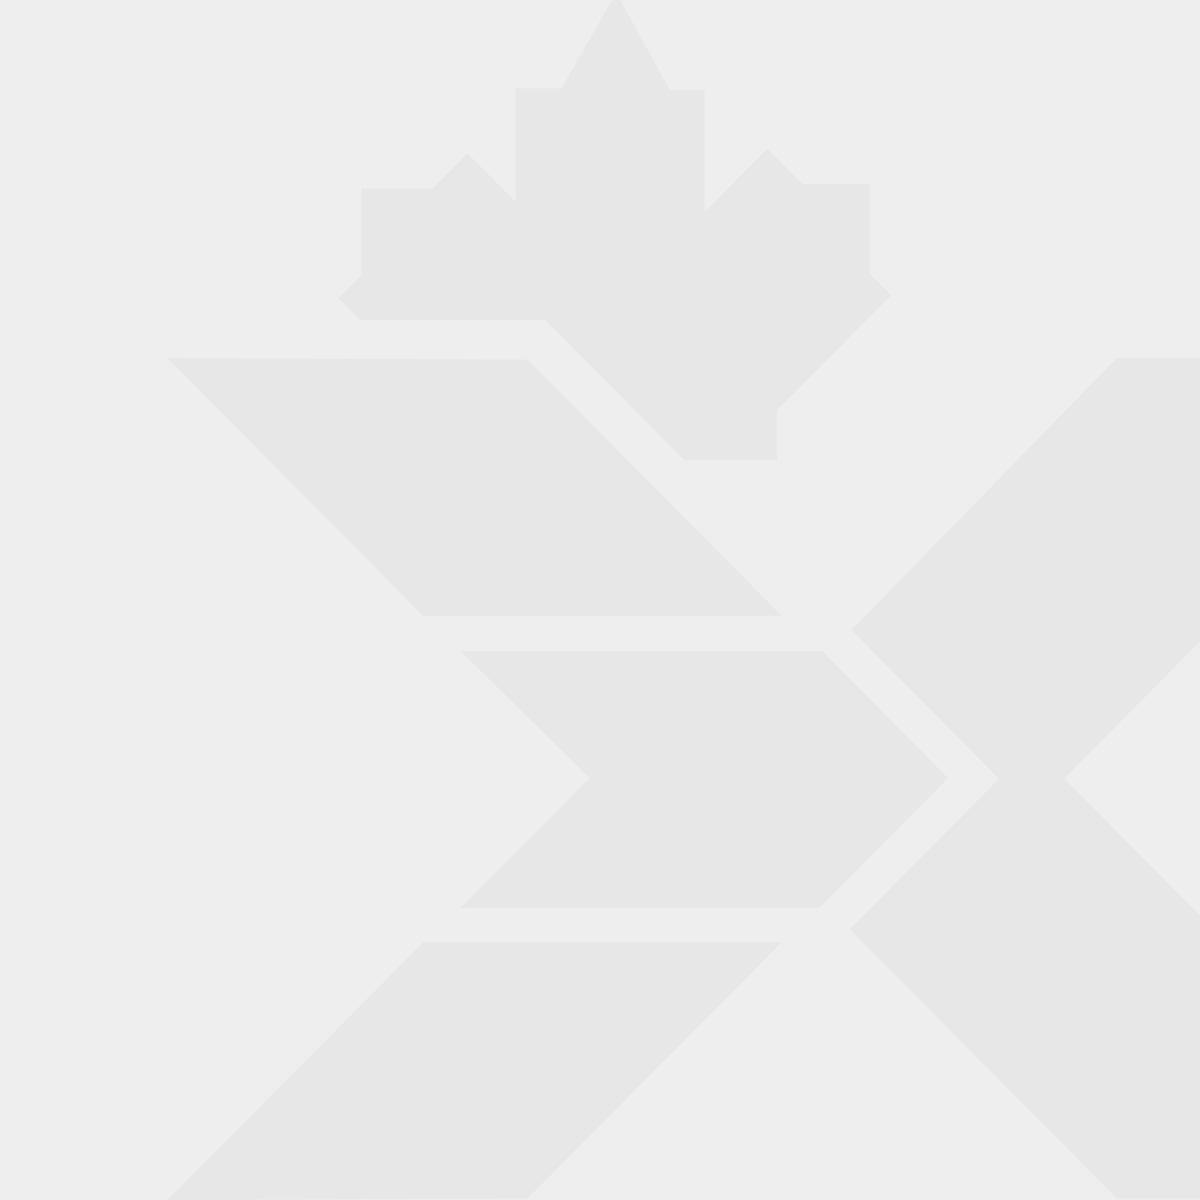 RCAF Sticker Sheet